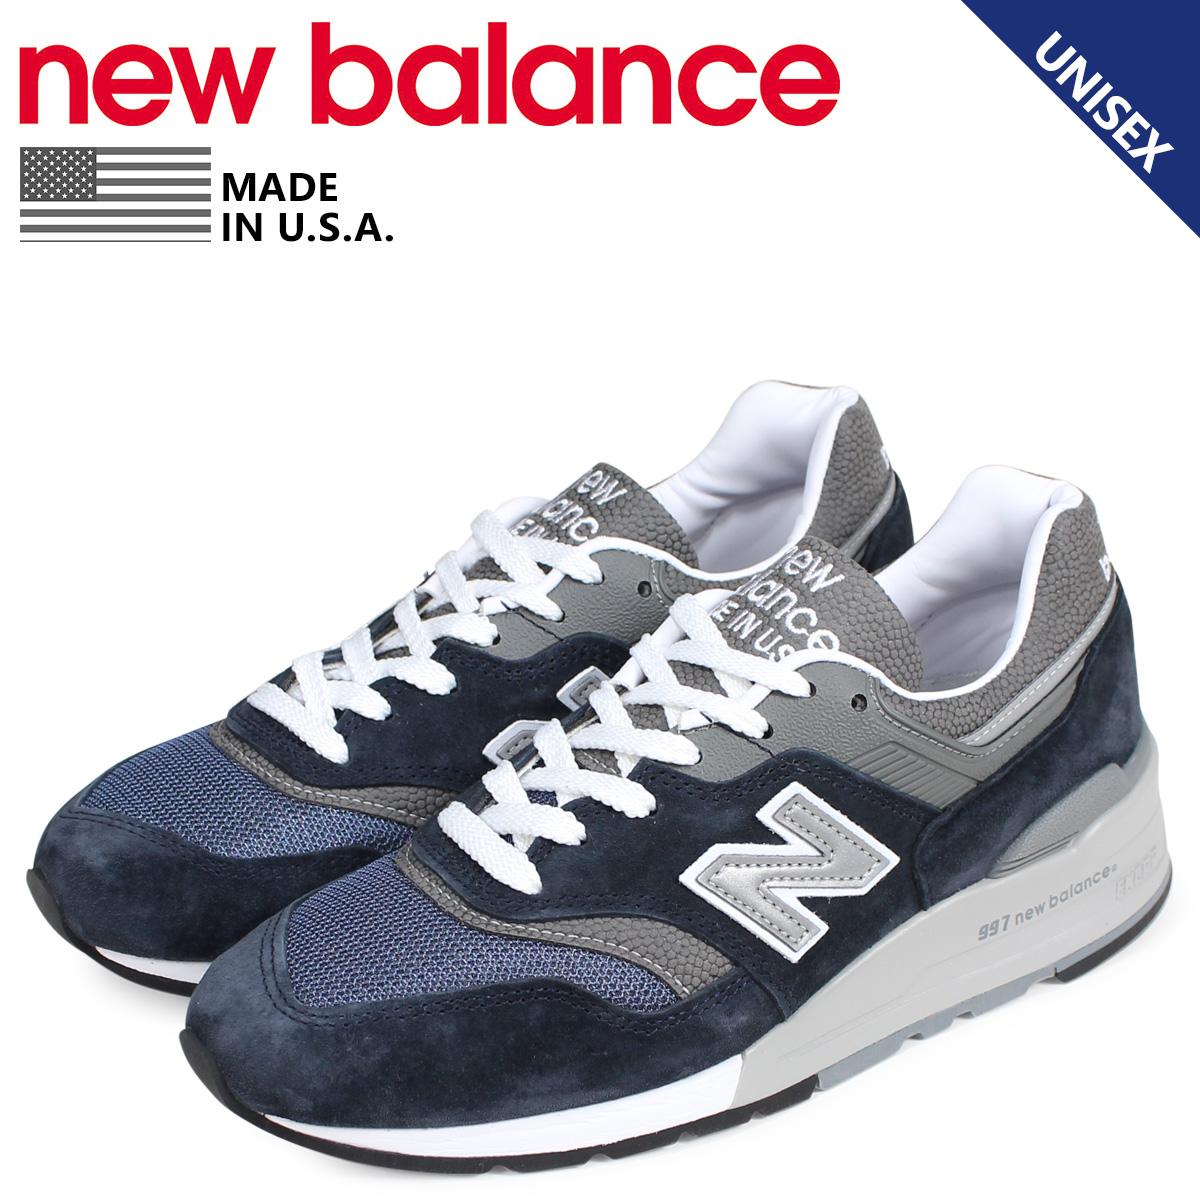 new balance ニューバランス 997 スニーカー メンズ レディース Dワイズ MADE IN USA ネイビー M997NV [4/2 追加入荷]